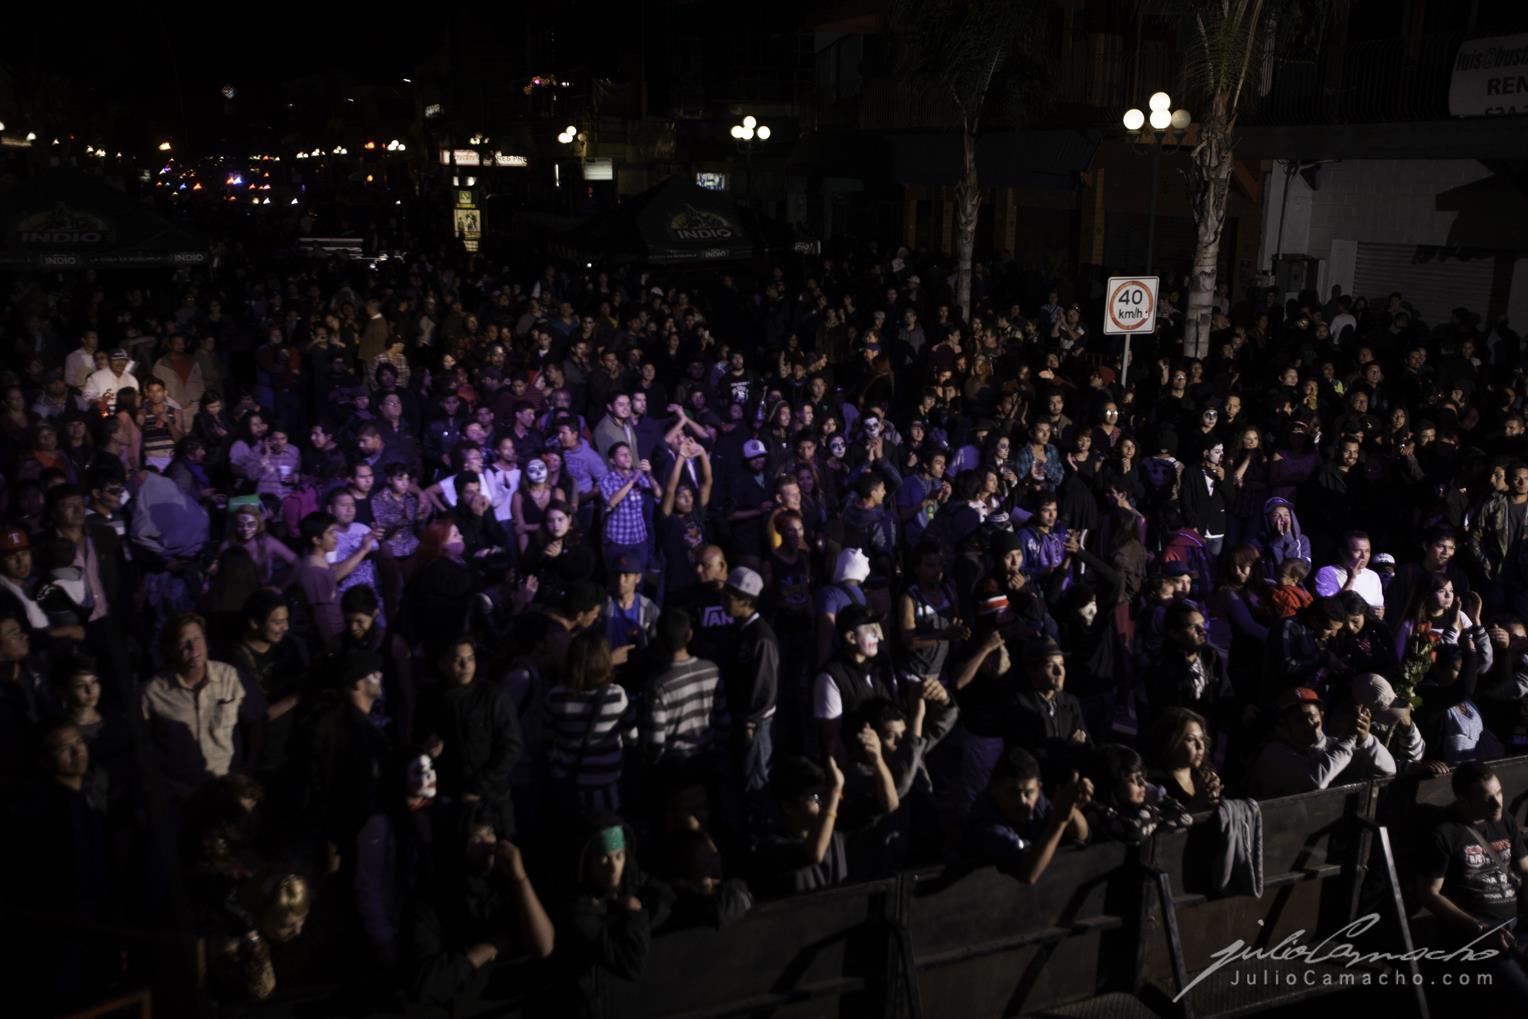 2014-10-30 31 CAST TOUR Ensenada y Tijuana - 1368 - www.Juli (Copy).jpg